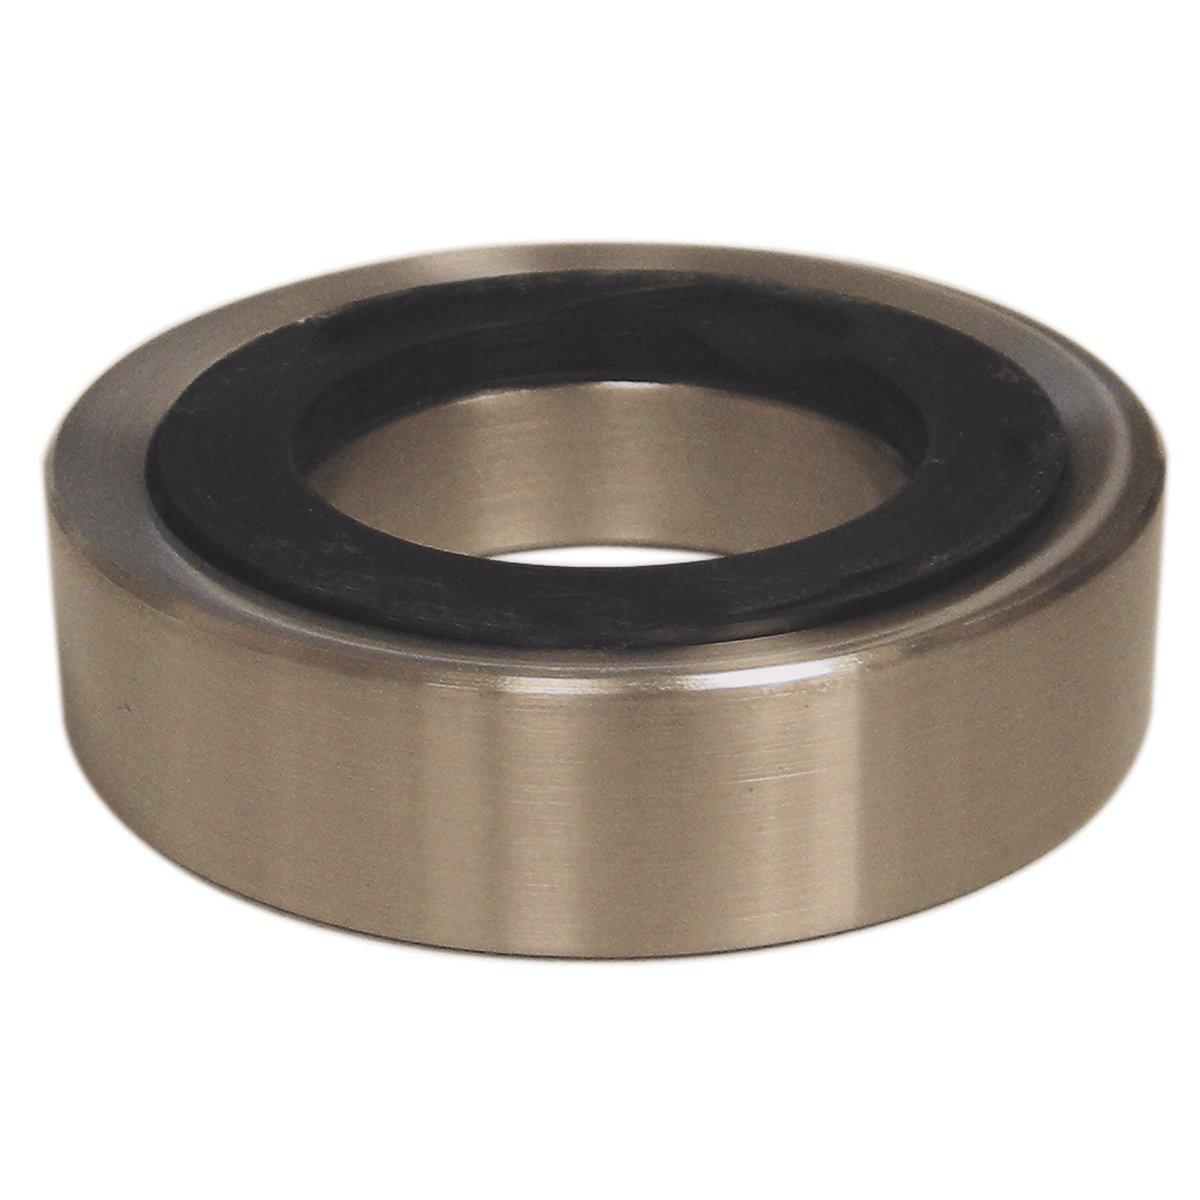 Danco 89490 4-Inch Decorative Vessel Sink Mounting Ring, Brushed Nickel